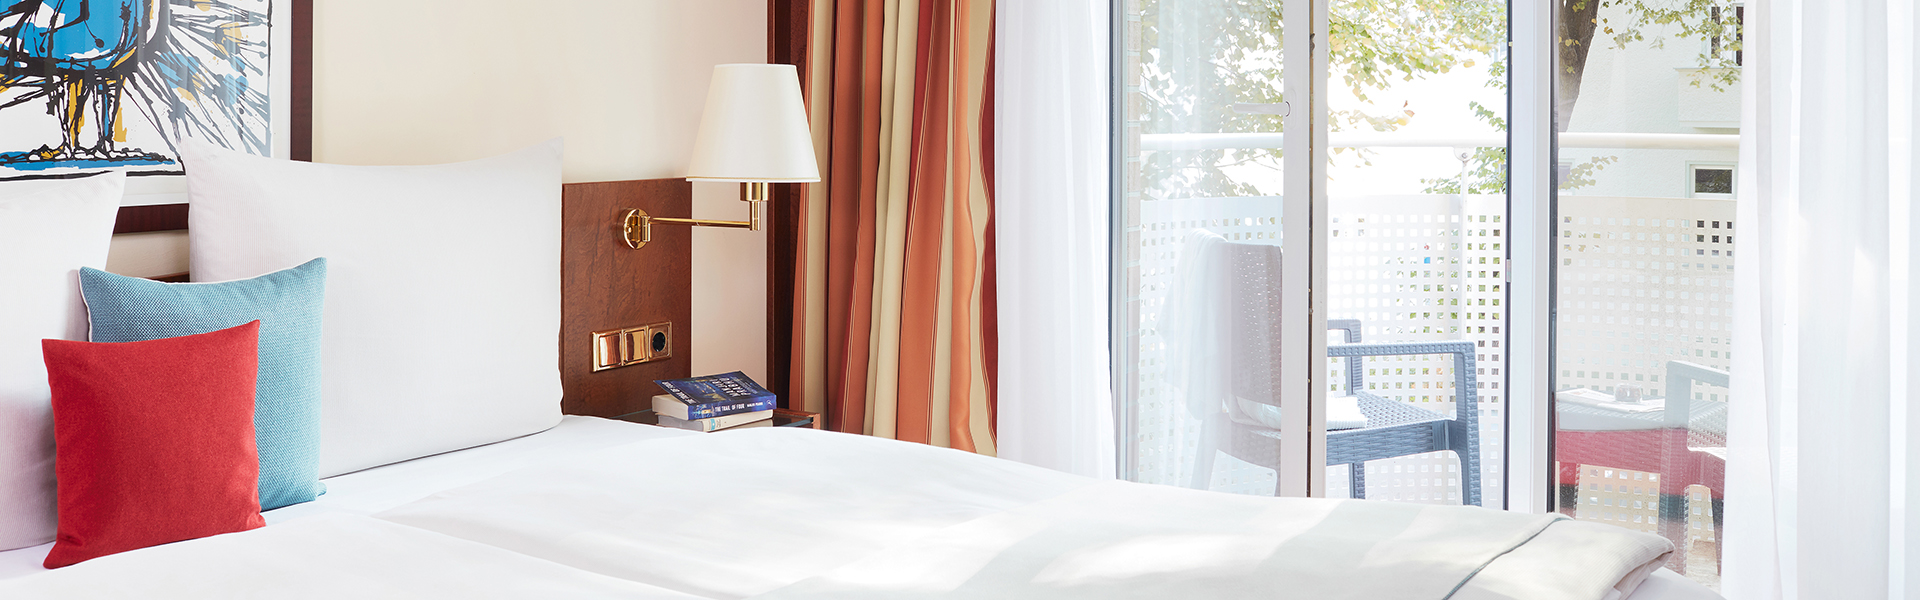 Living Hotel Weissensee Berlin Zimmer